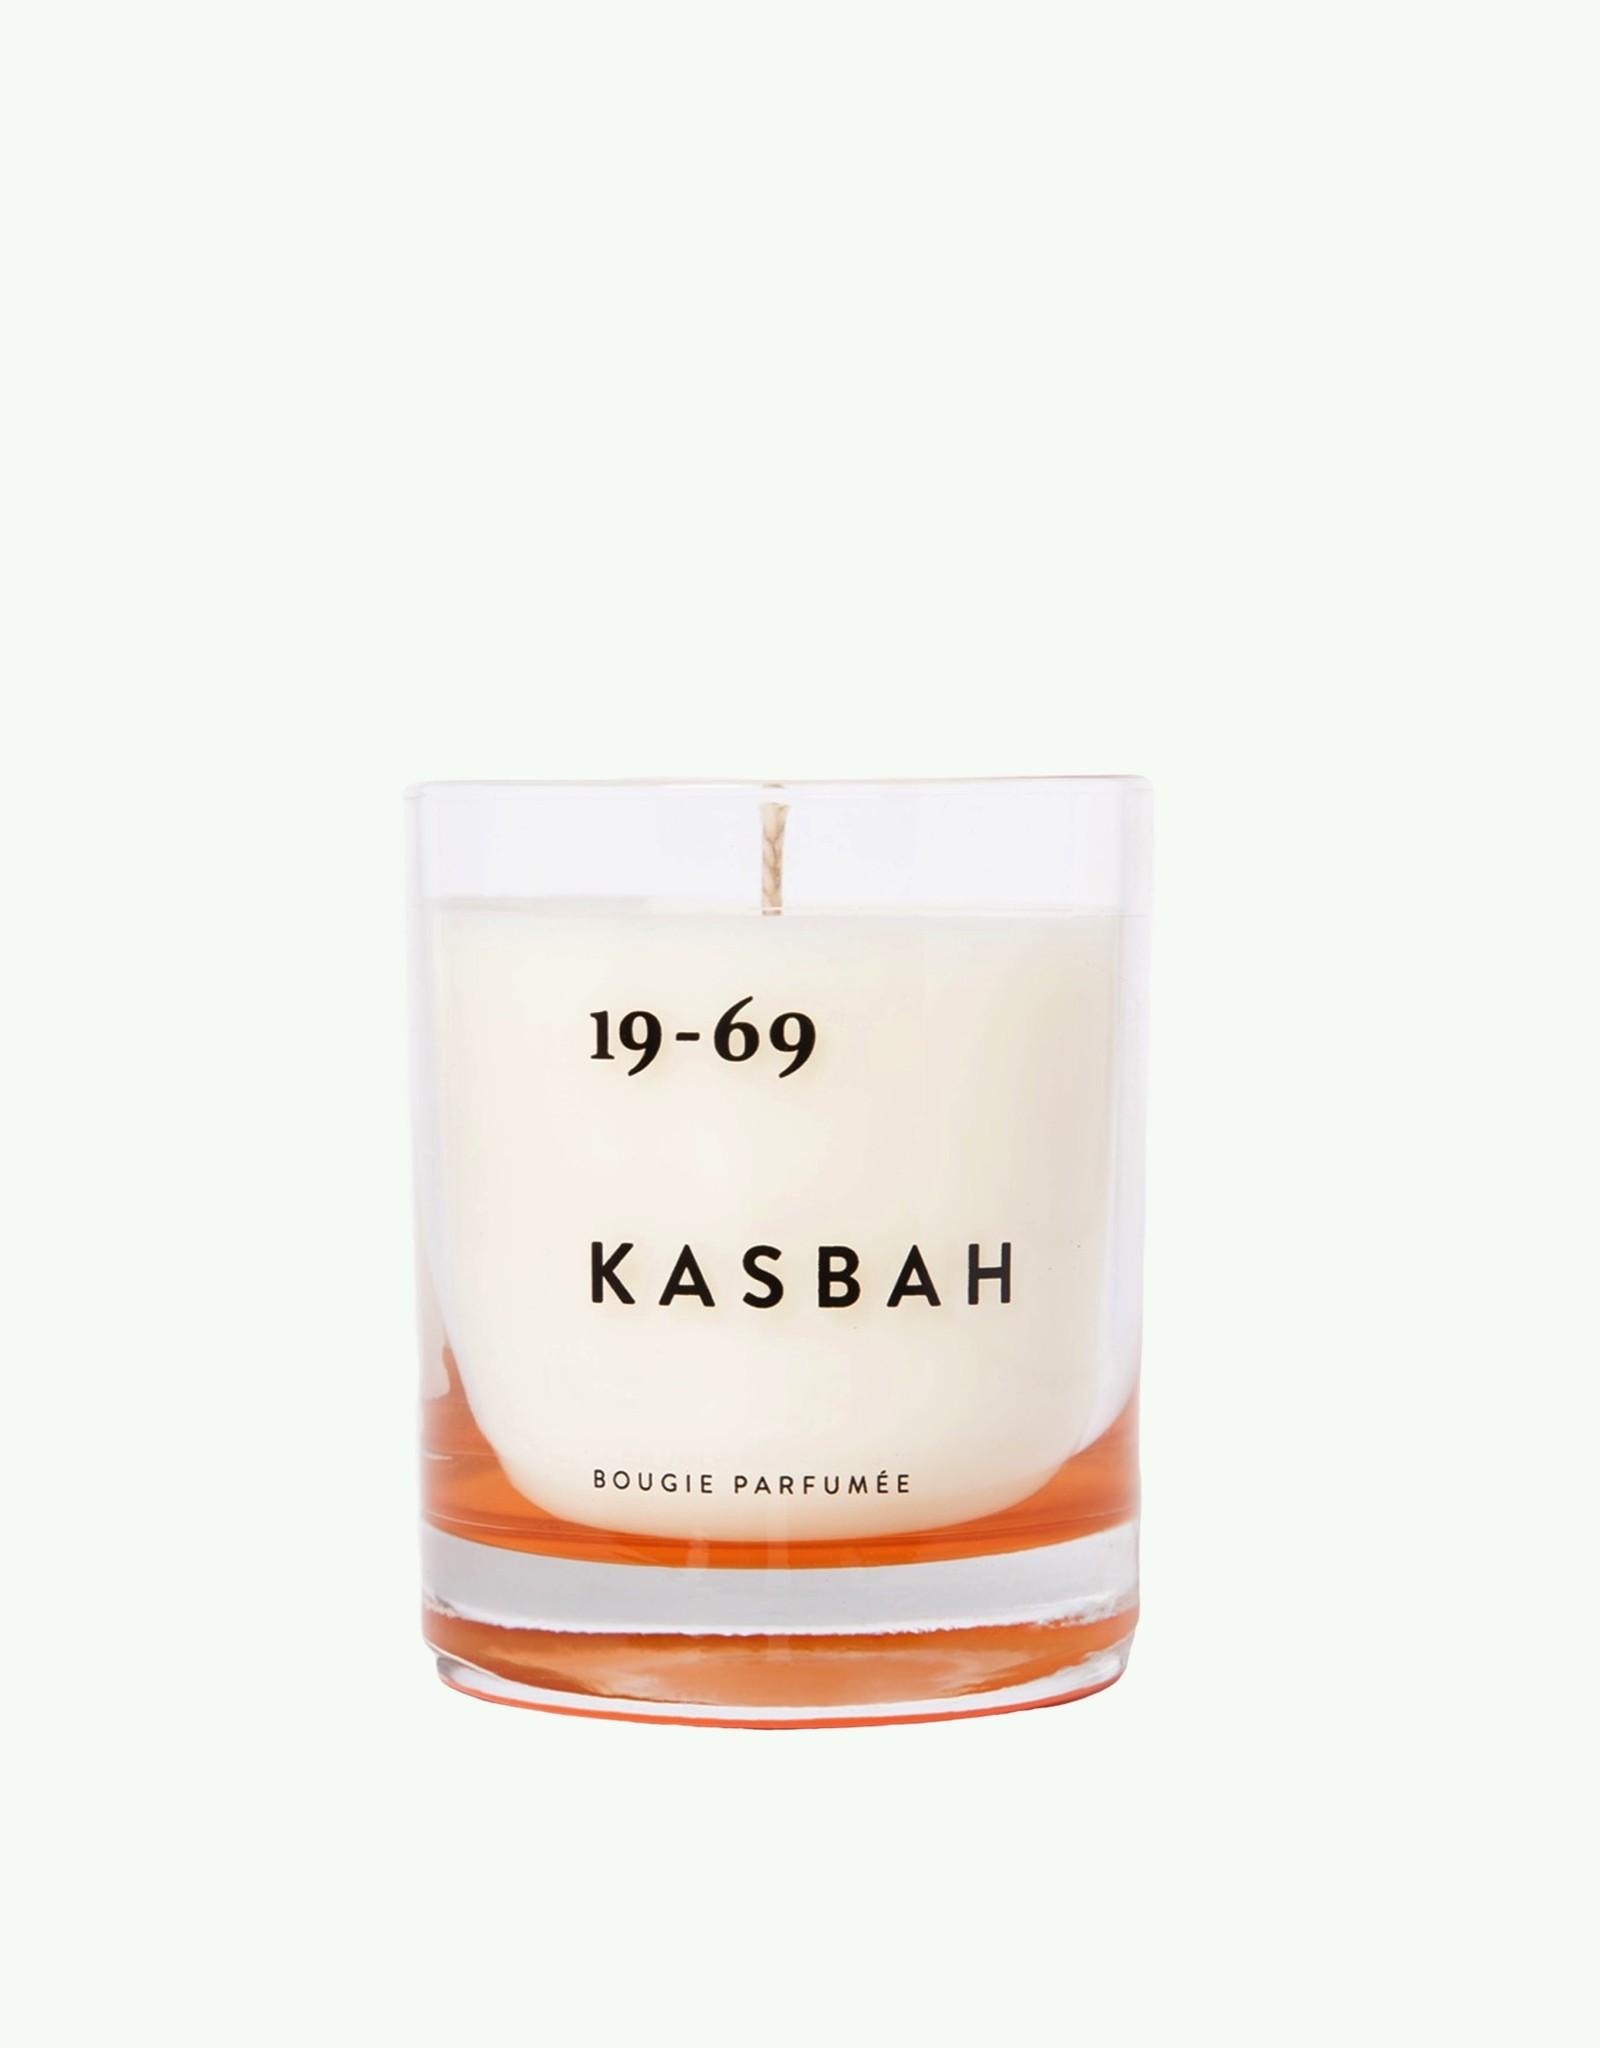 Nineteen Sixty Nine Nineteen sixty nine - Kasbah - Bougie parfumée